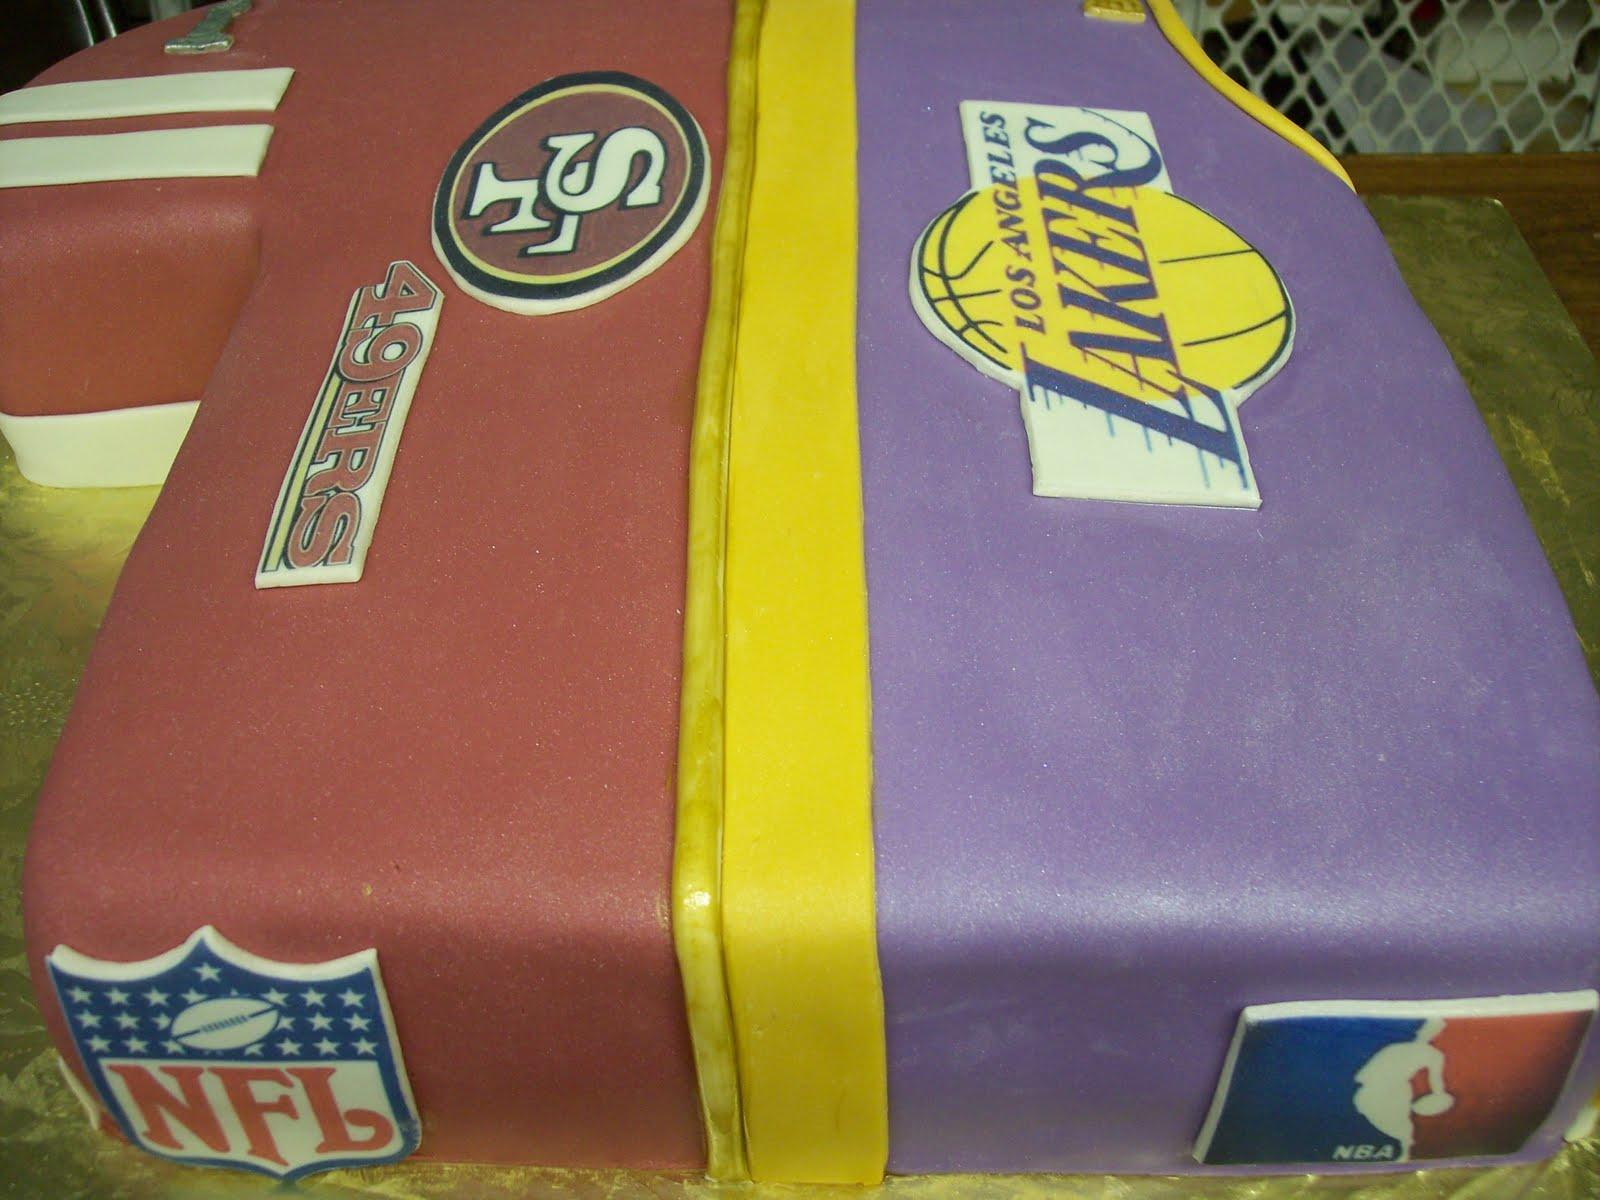 49er Laker Jersey Grooms Cake